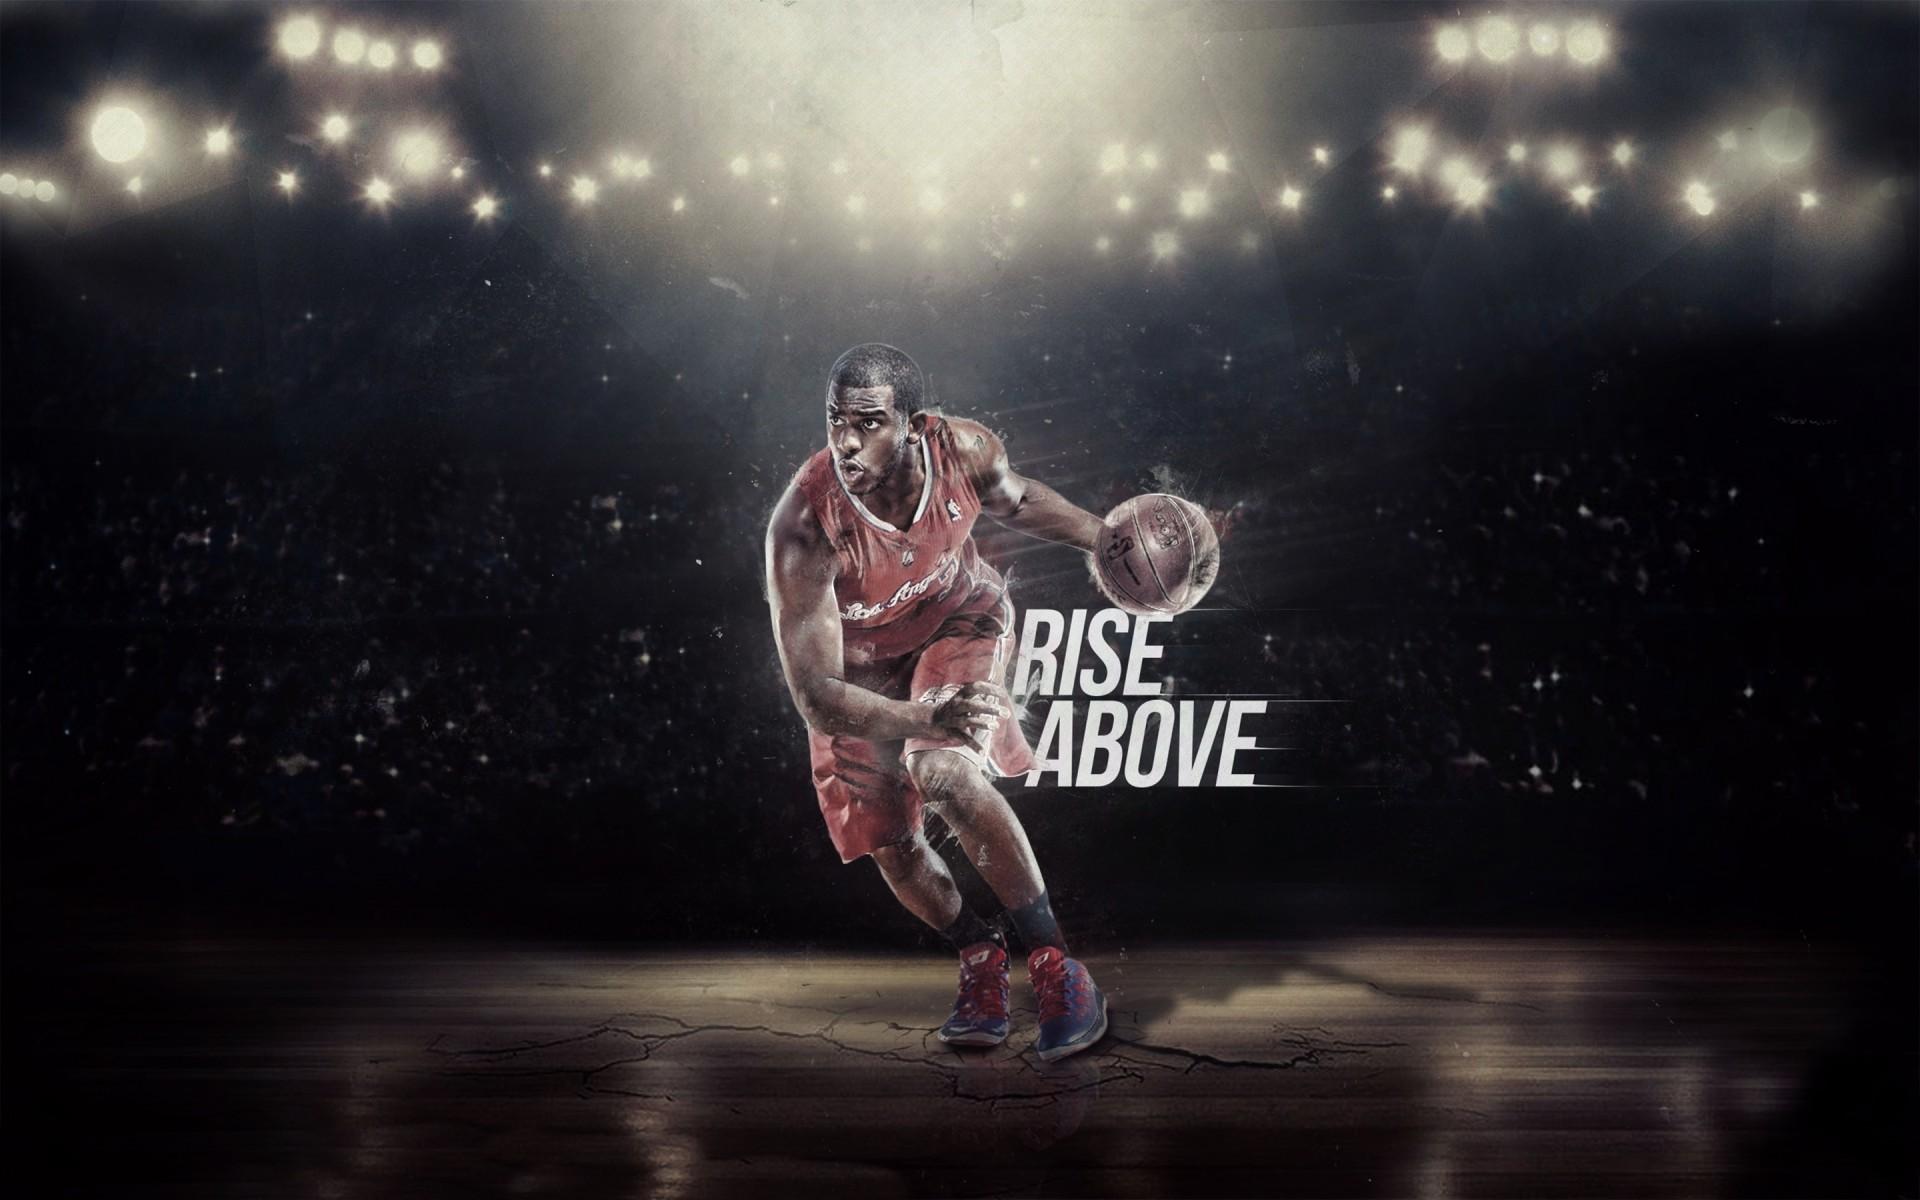 paul rise player nba basketball wallpaper 1920x1200